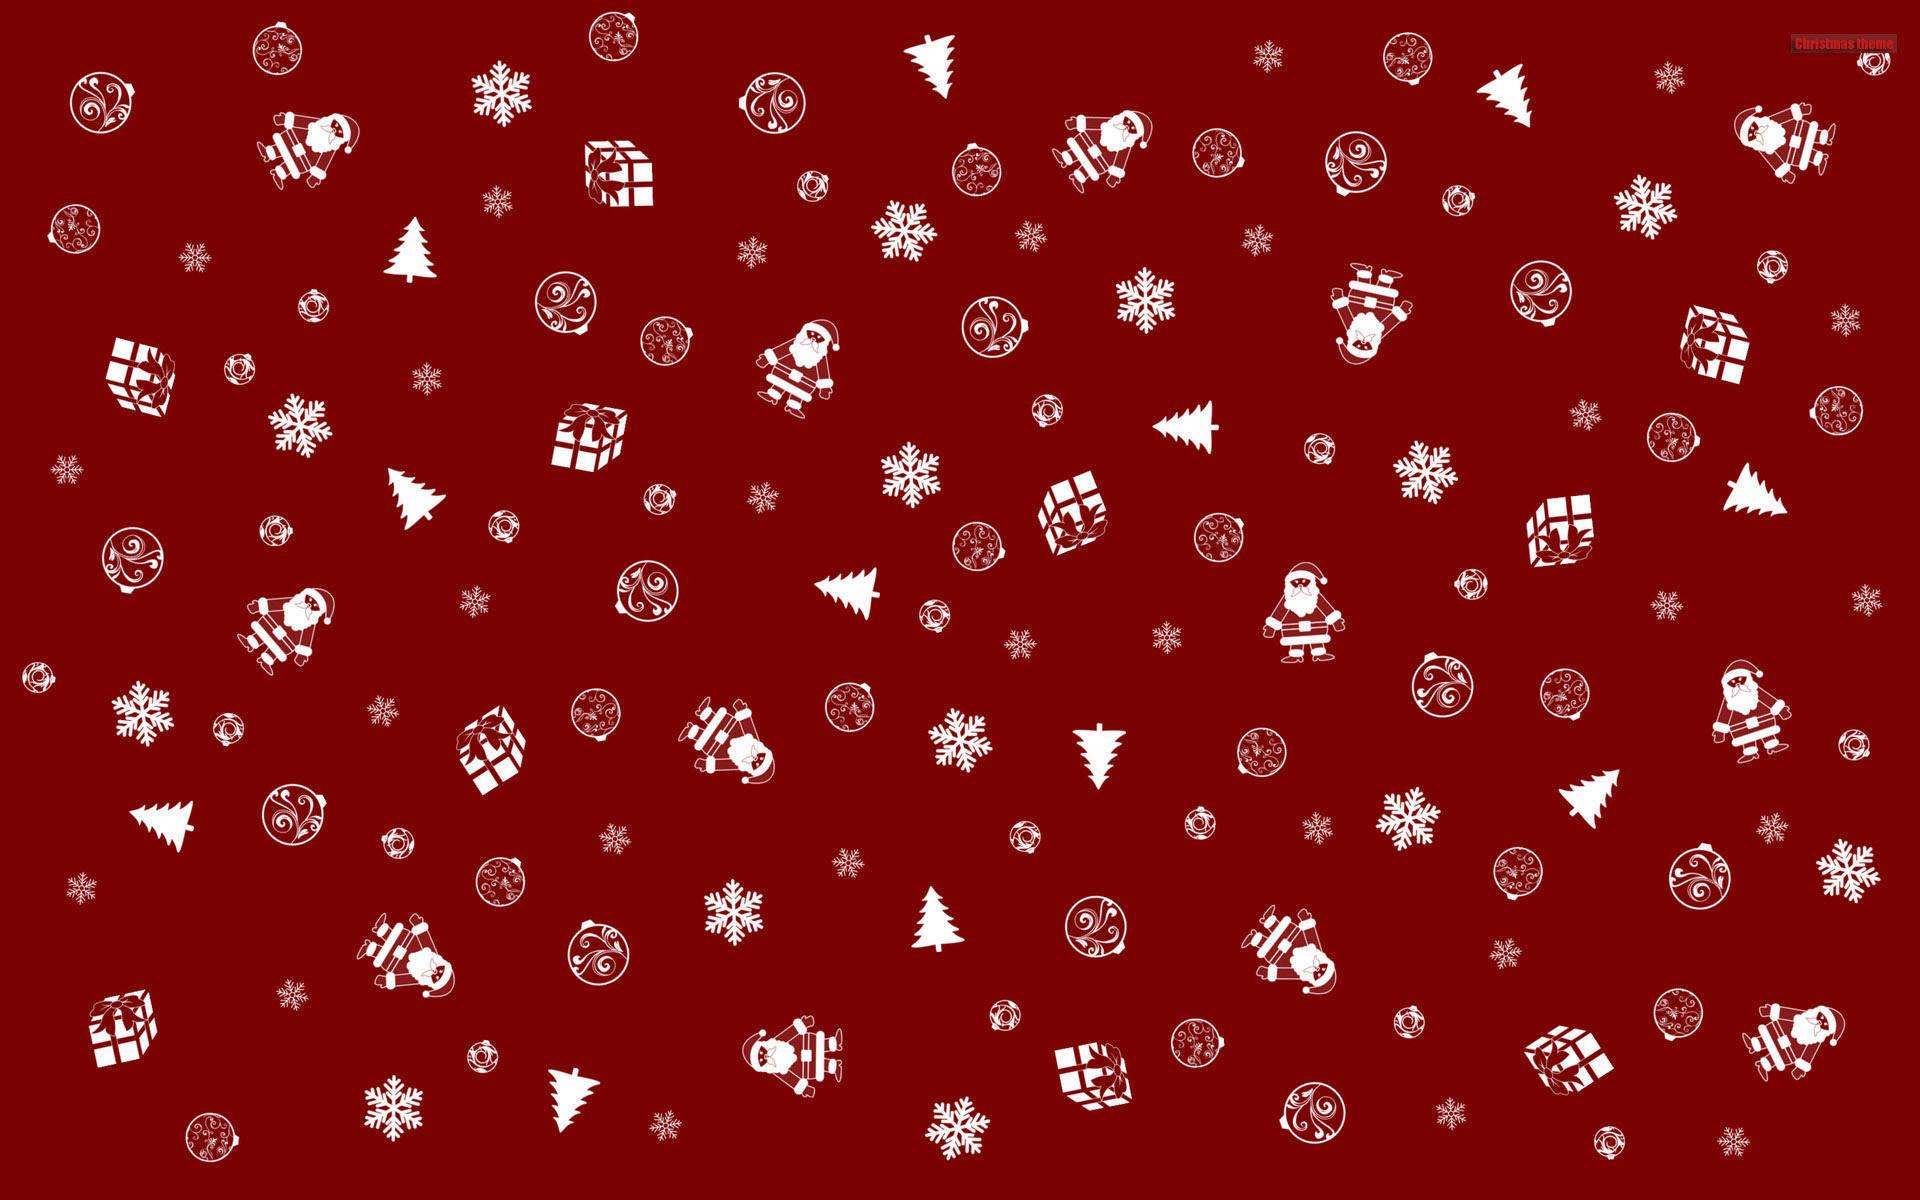 Christmas theme symbols wallpaper : HD wallpaper, Background wallpaper